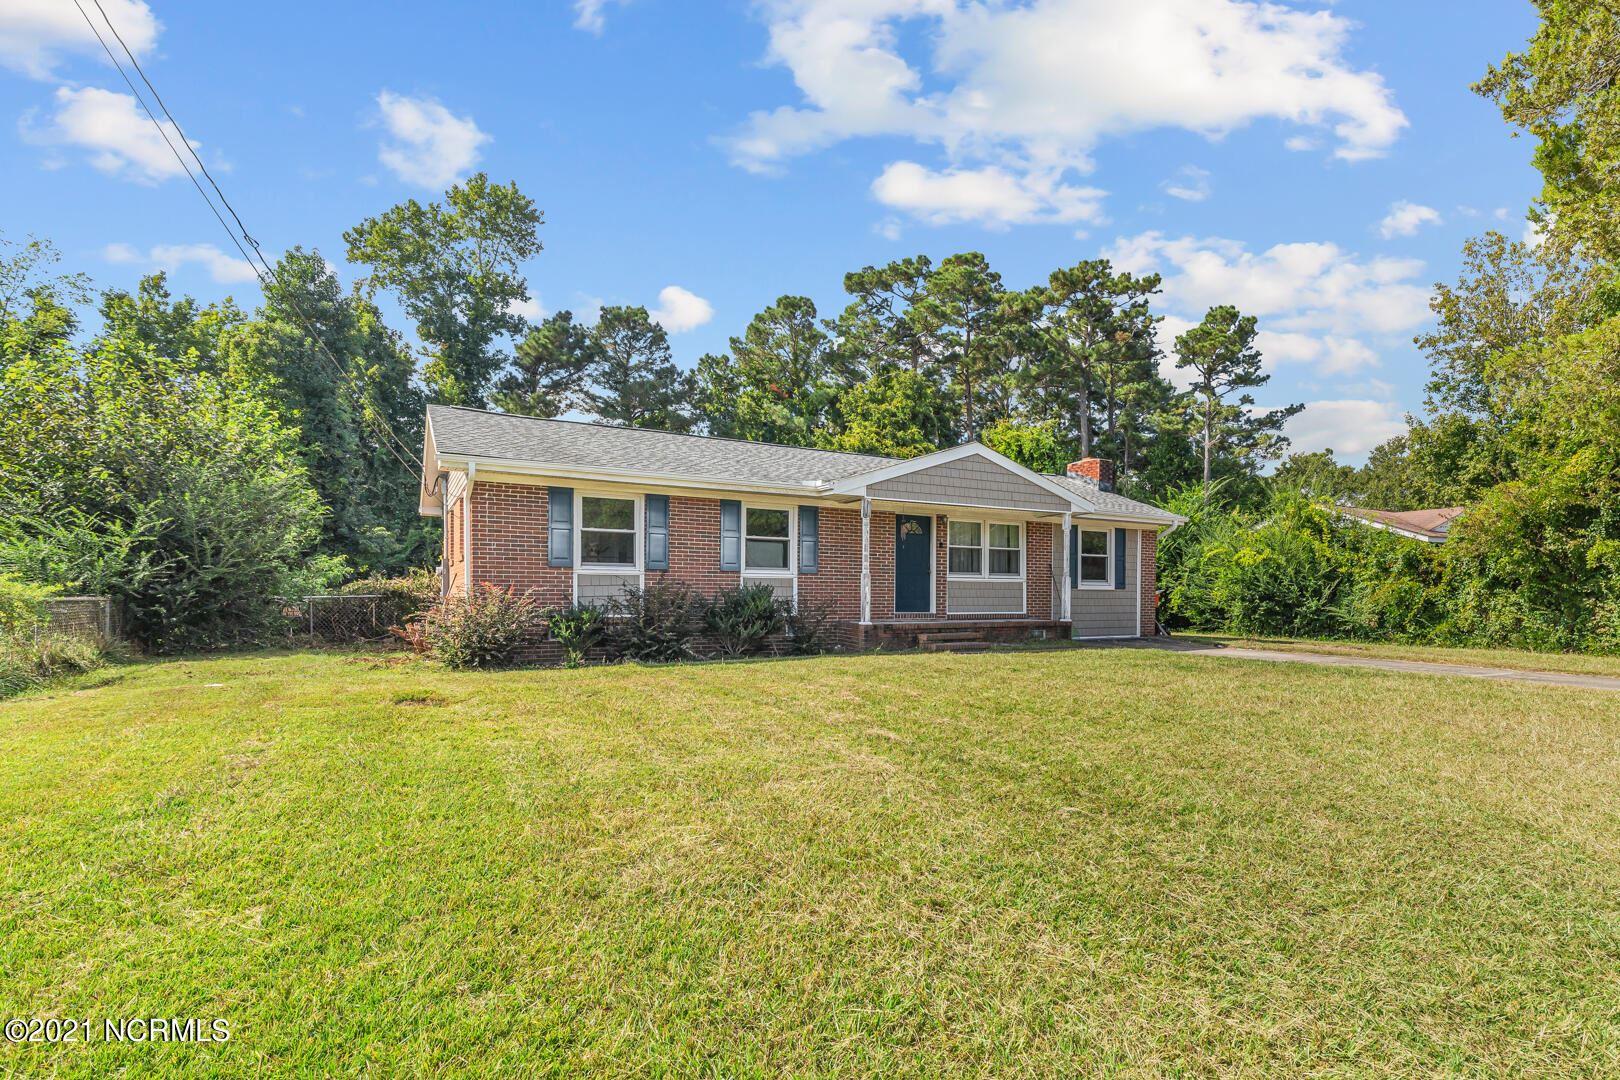 Photo of 23 Victoria Road, Jacksonville, NC 28546 (MLS # 100293866)